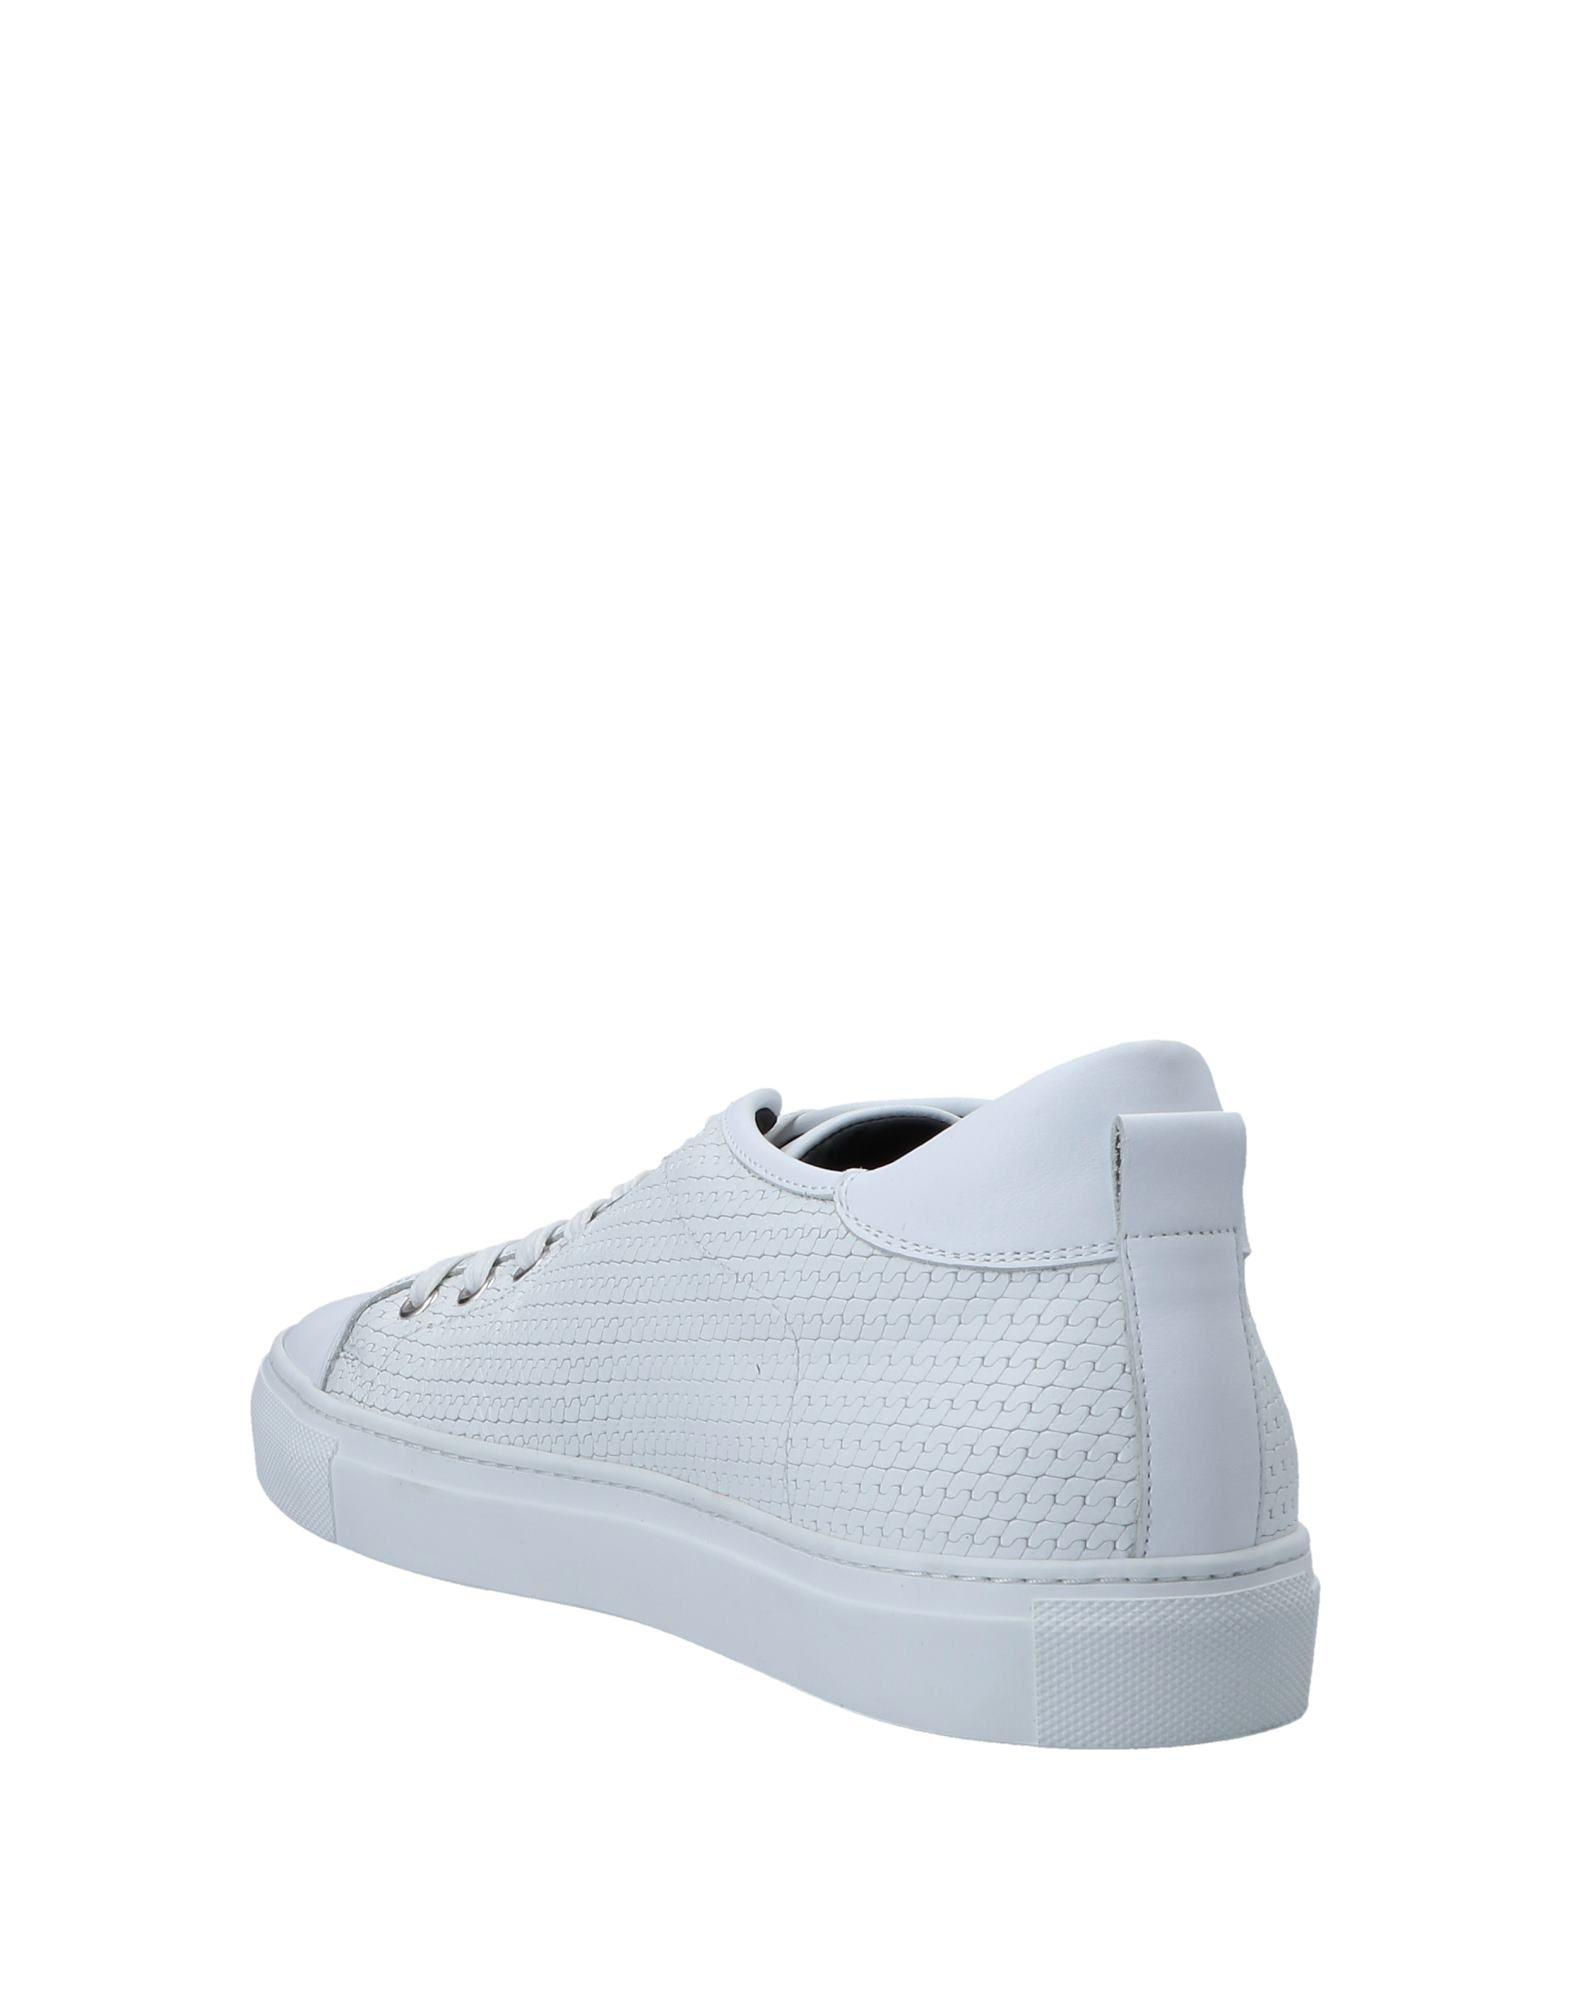 Rabatt echte Schuhe O★M Sneakers  Orzo & Malto Sneakers O★M Herren  11557048FP 3df56e